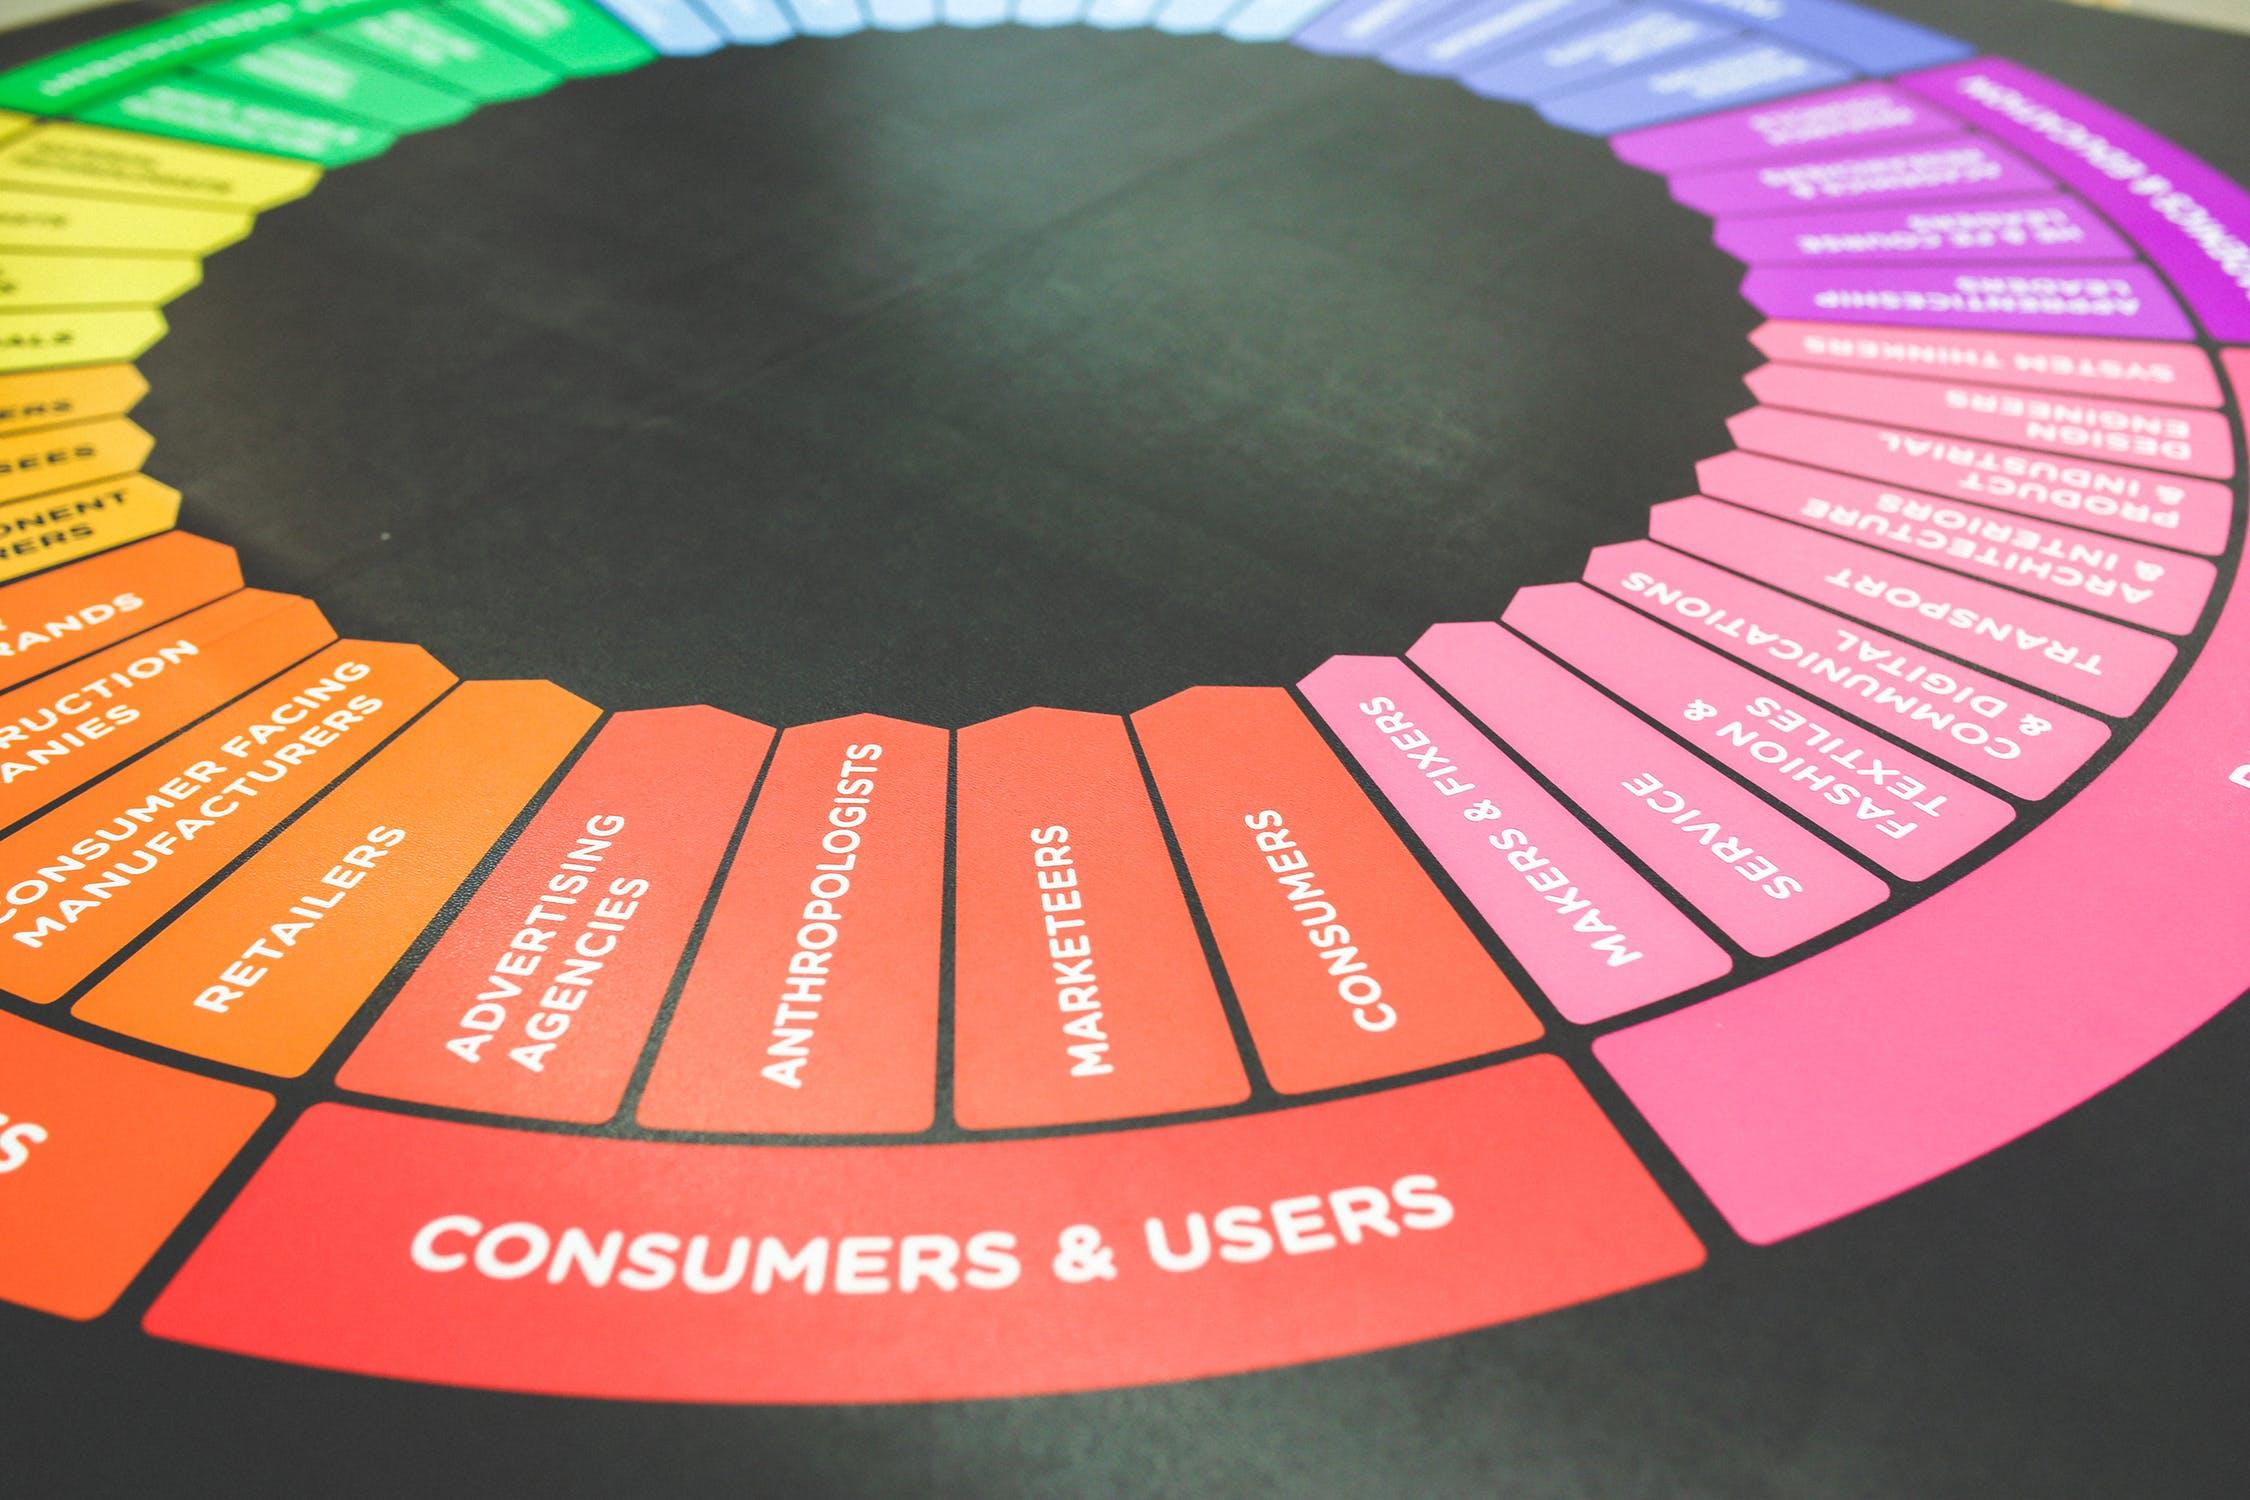 Digital Marketing Trends You Must Follow in 2018 | Marketing Insider